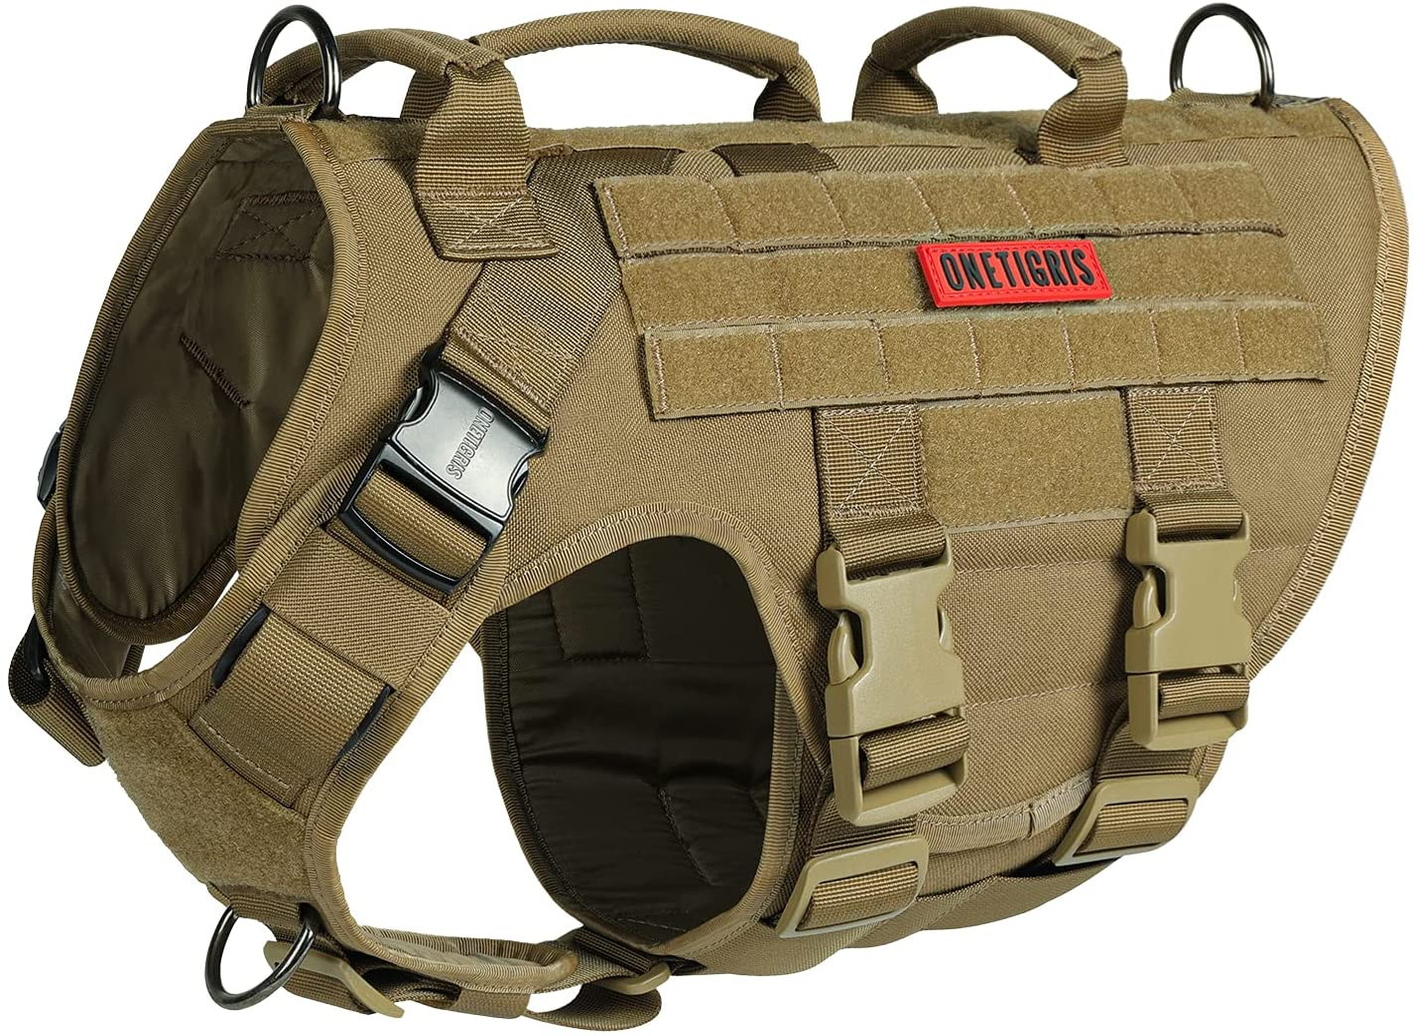 OneTigris Large Time sale Tactical Dog Harness Adjustable Pulling High quality No